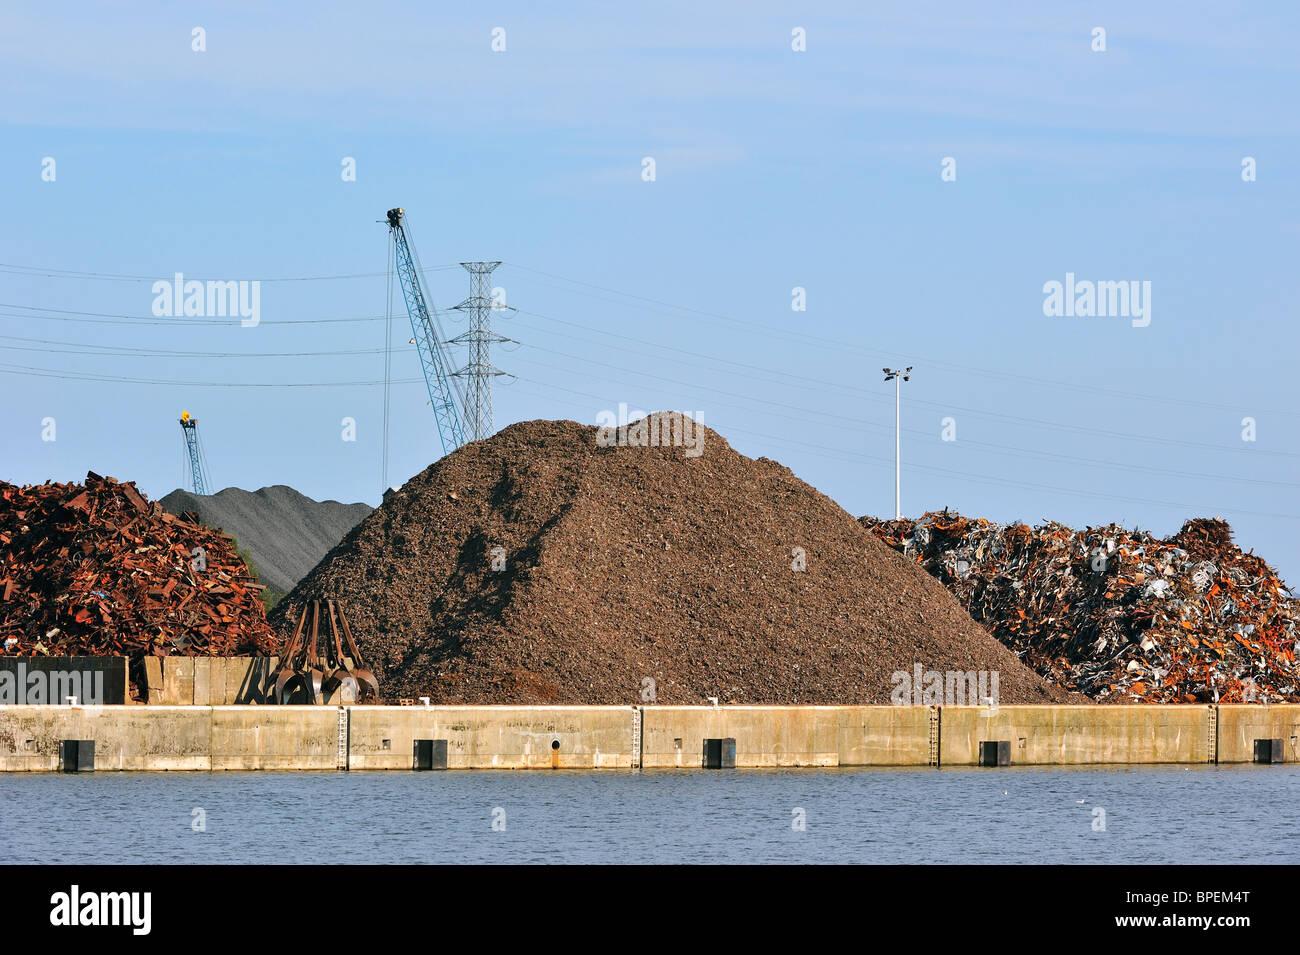 Scrap heap along the Ghent-Terneuzen Canal at Ghent seaport, Belgium - Stock Image